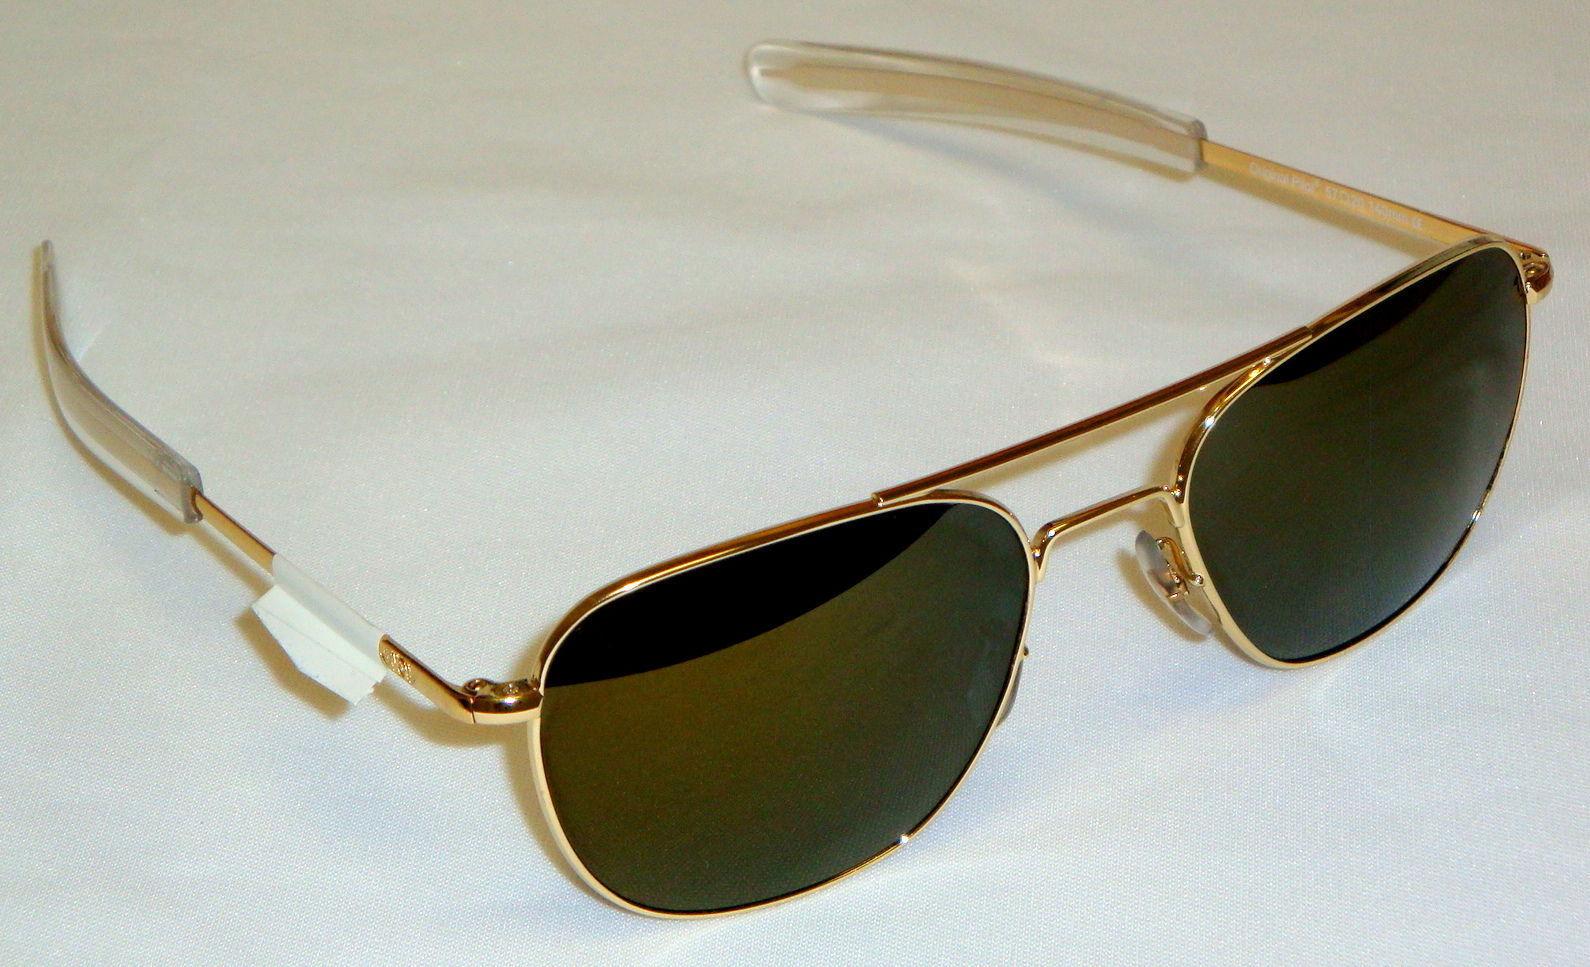 bcd8ab5c03 Gafas para piloto / graduada - Classic Airman - Zurich Sunglasses